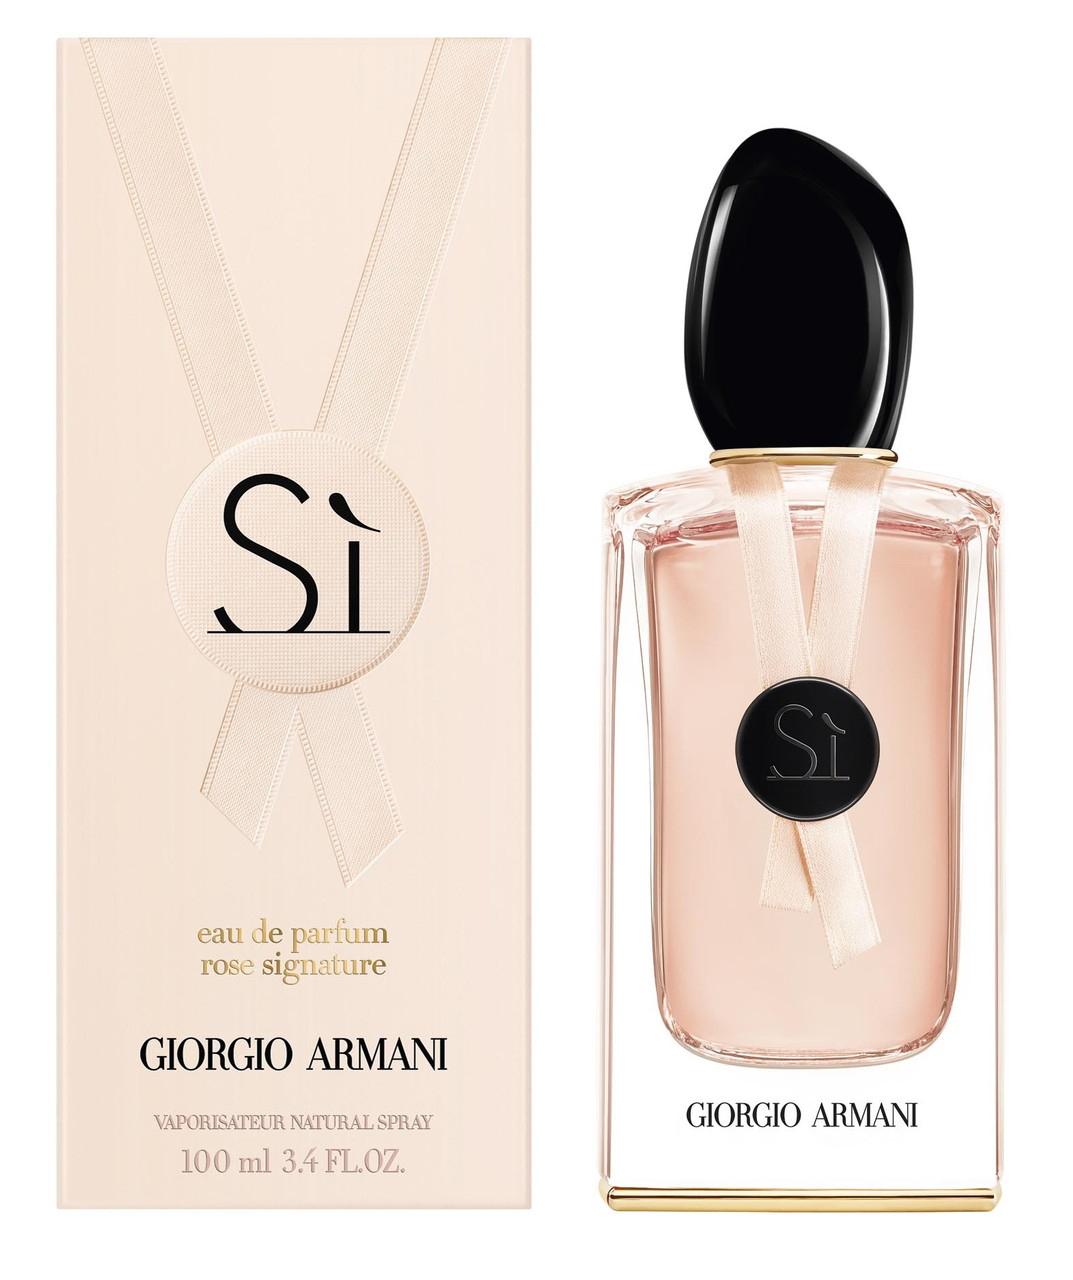 Armani Si Rose Signature 2 Eau De Parfum 100ml парфюмированная вода